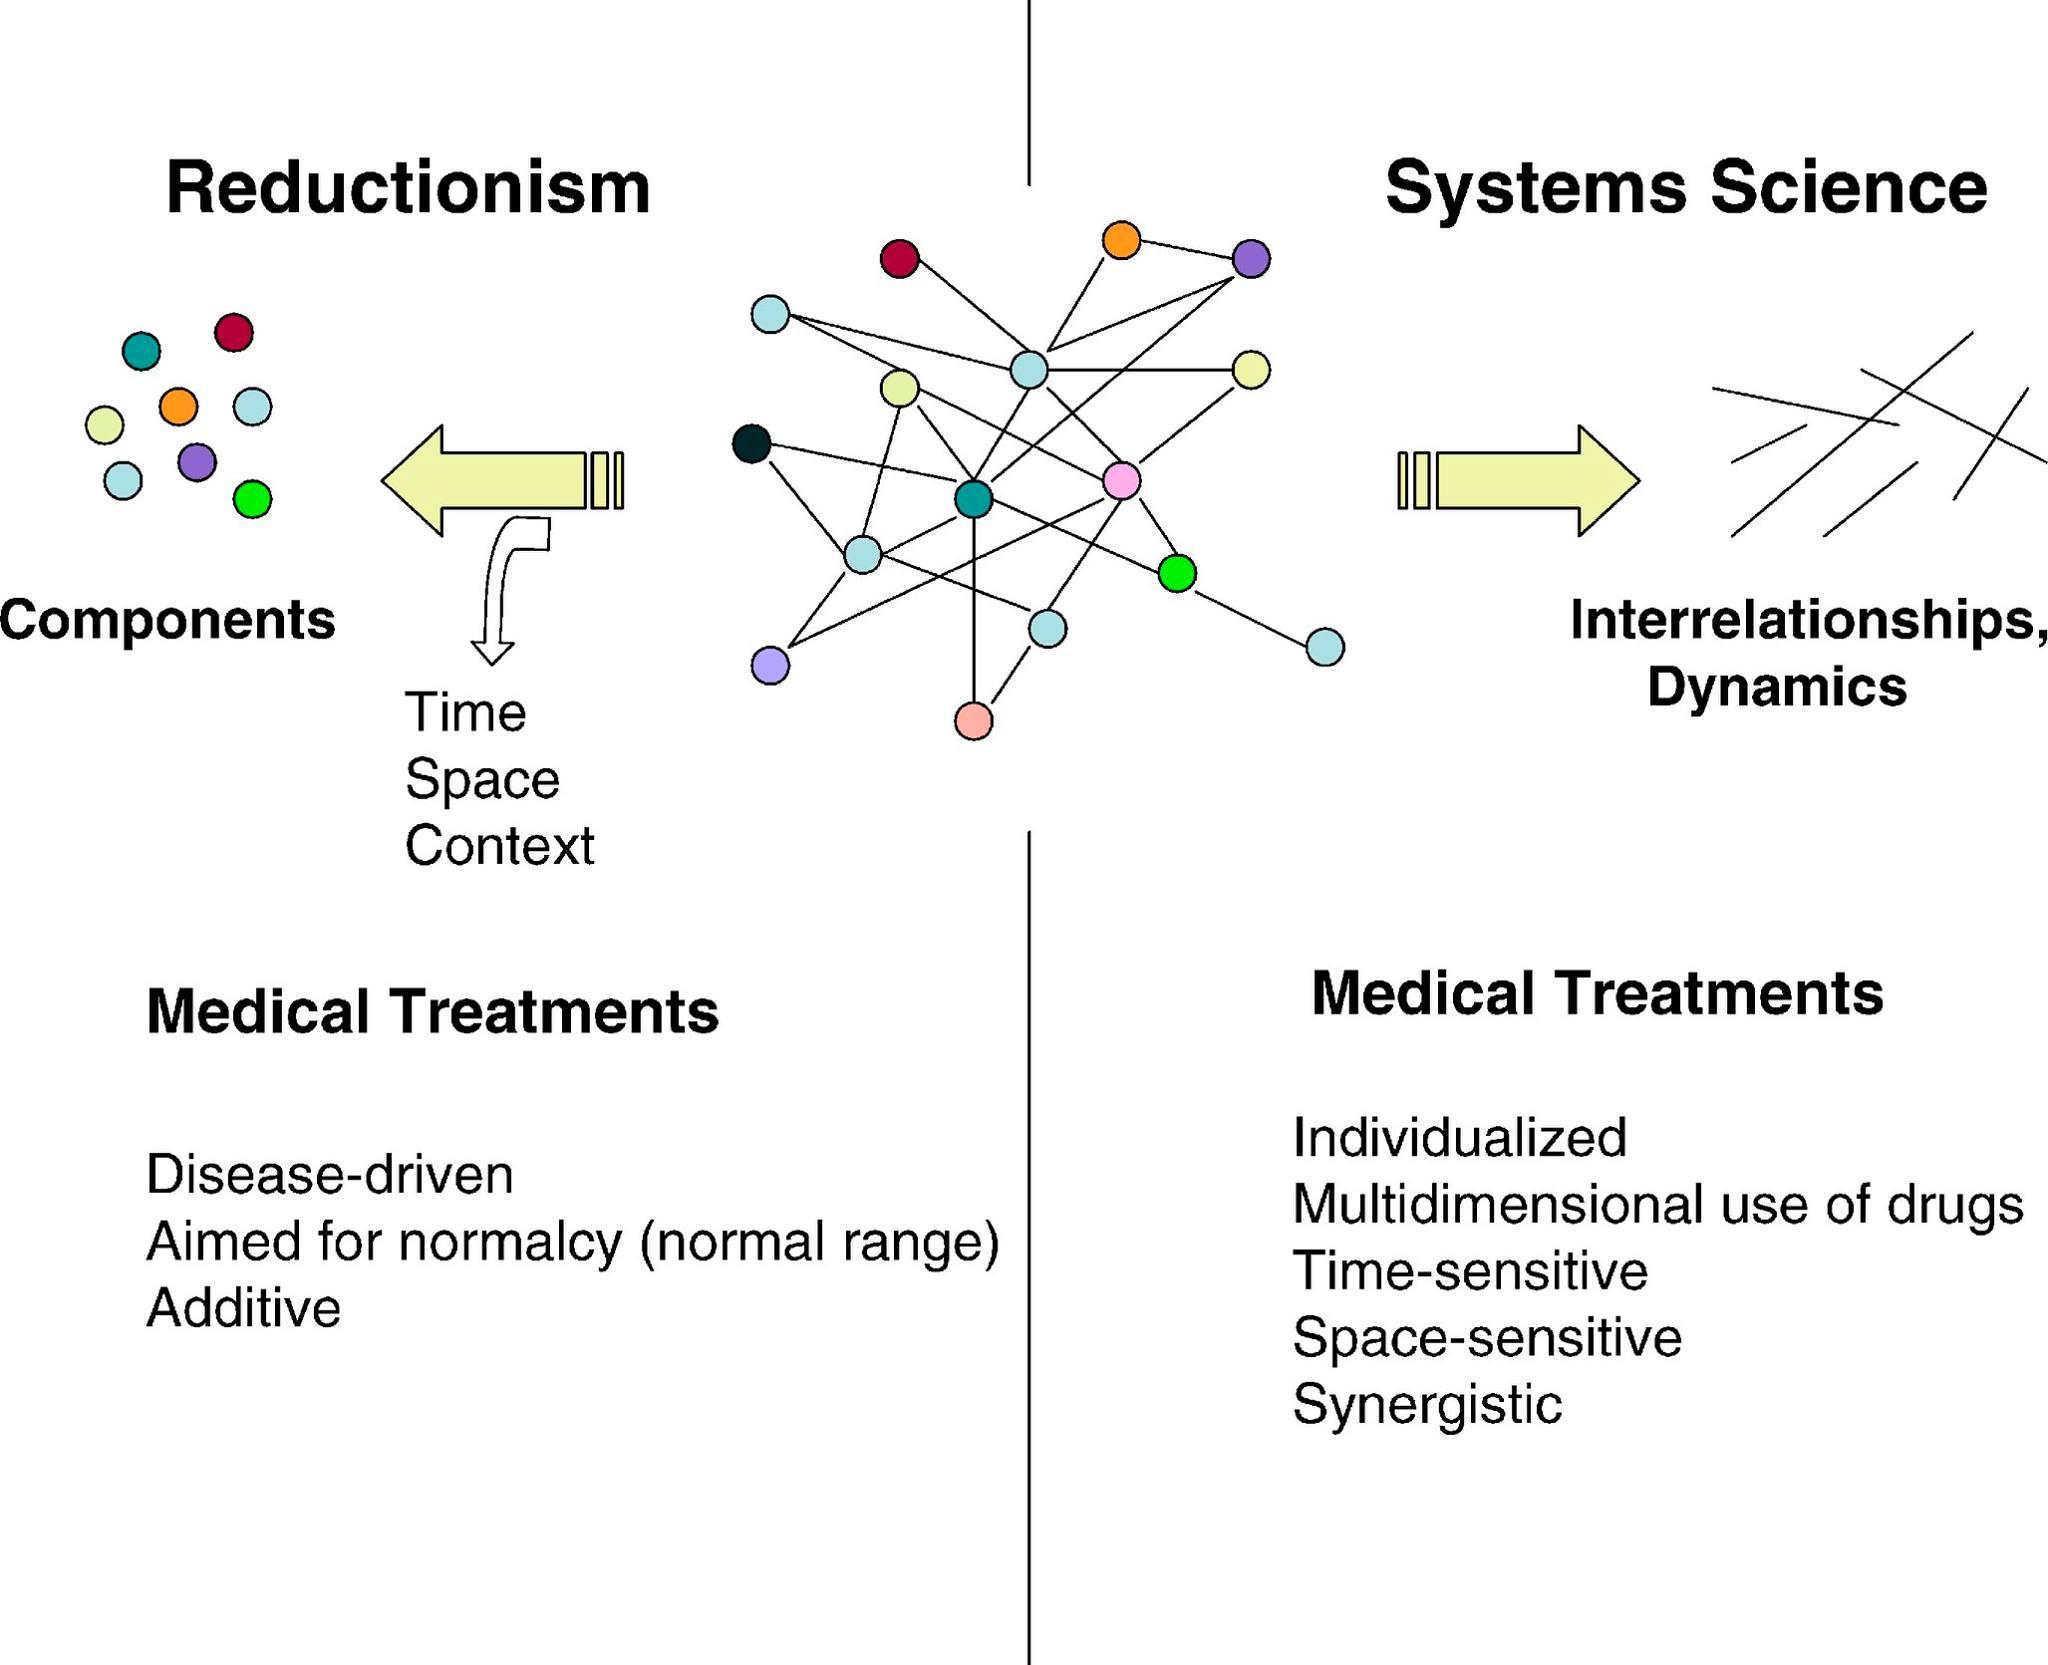 System vs Reductionist